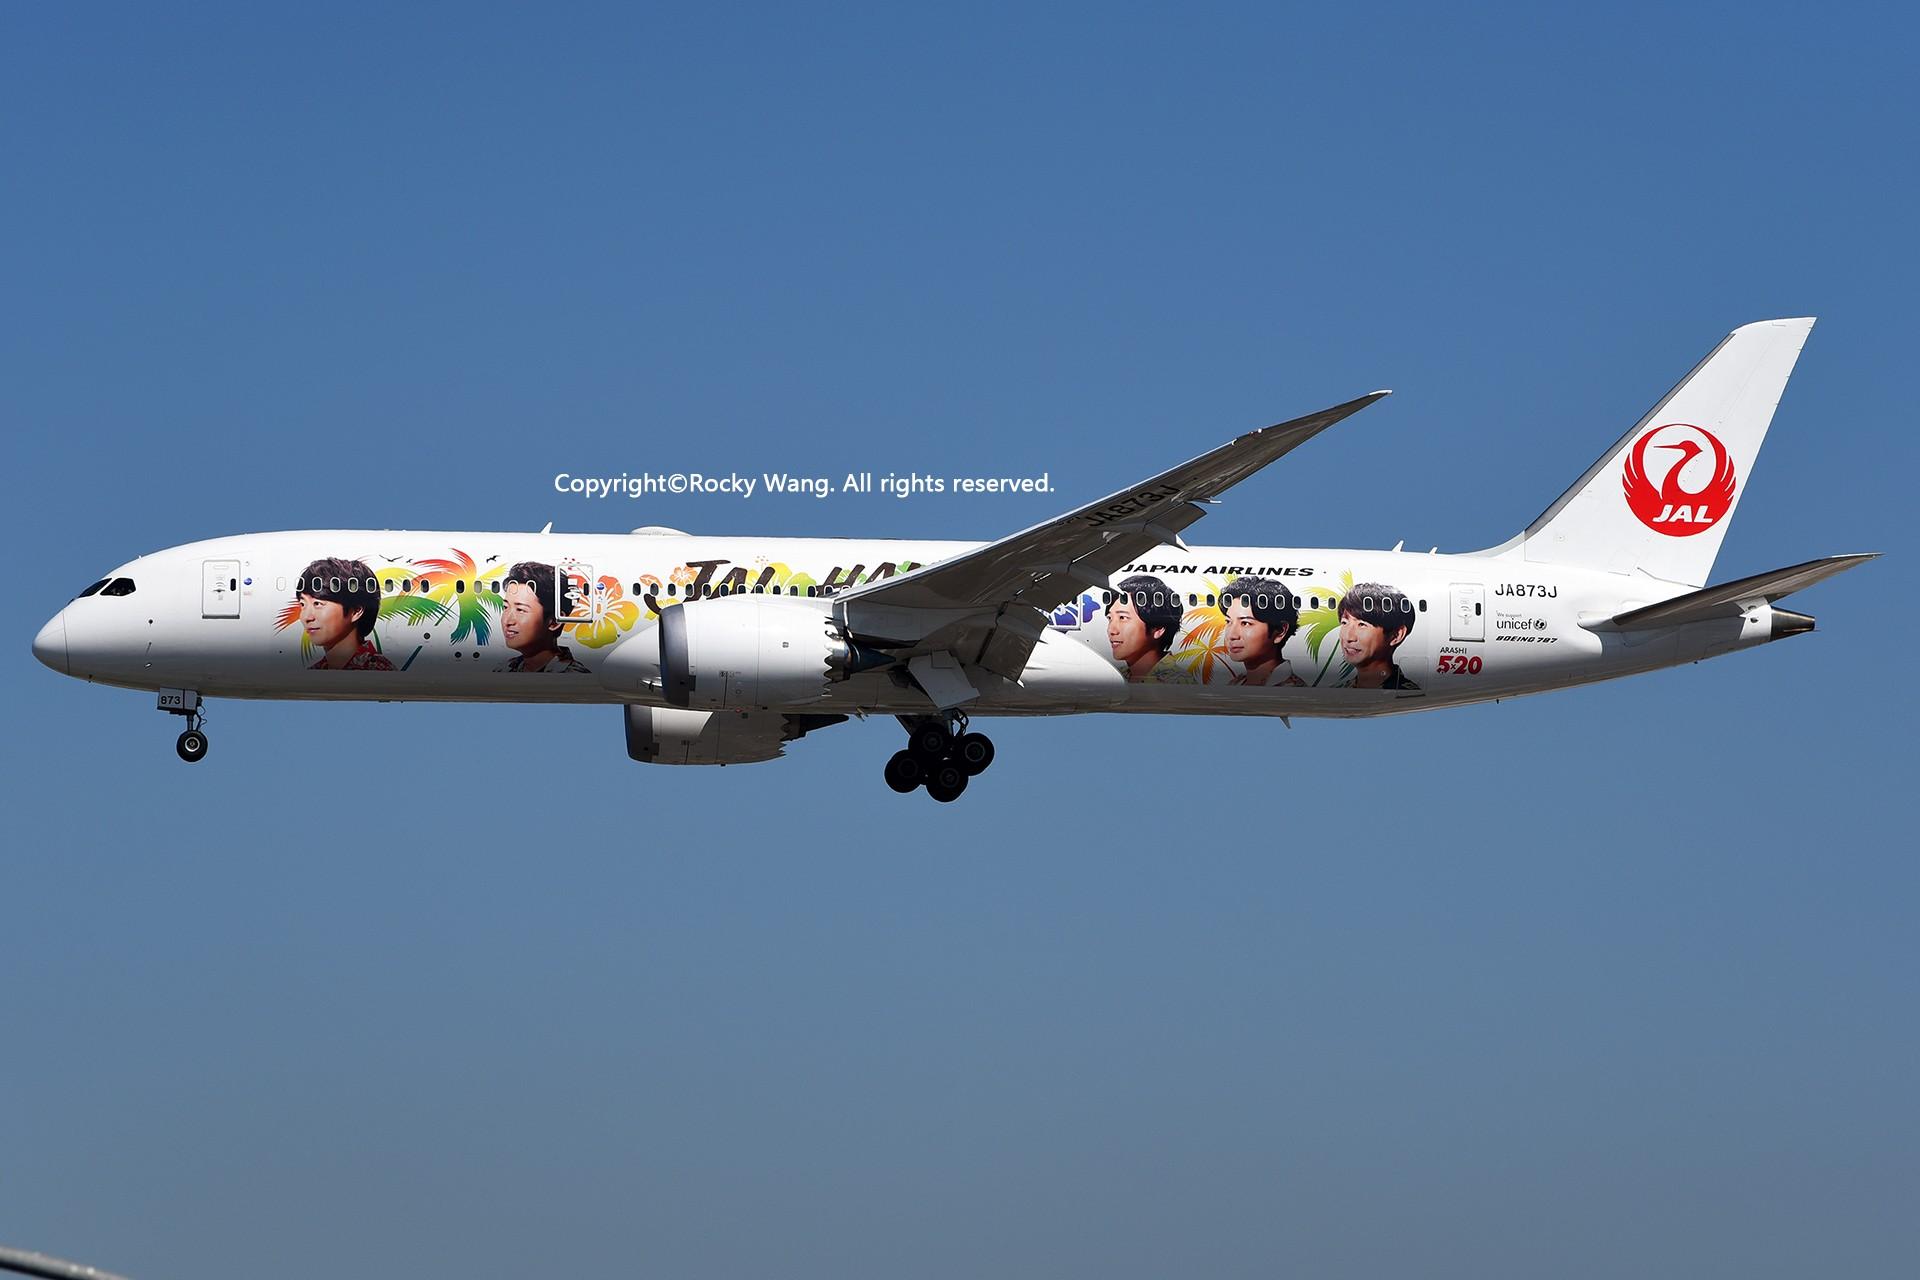 Re:[原创]彩绘圣地-附加彩蛋 BOEING 787-9 DREAMLINER JA873J Los Angeles Int'l Airport